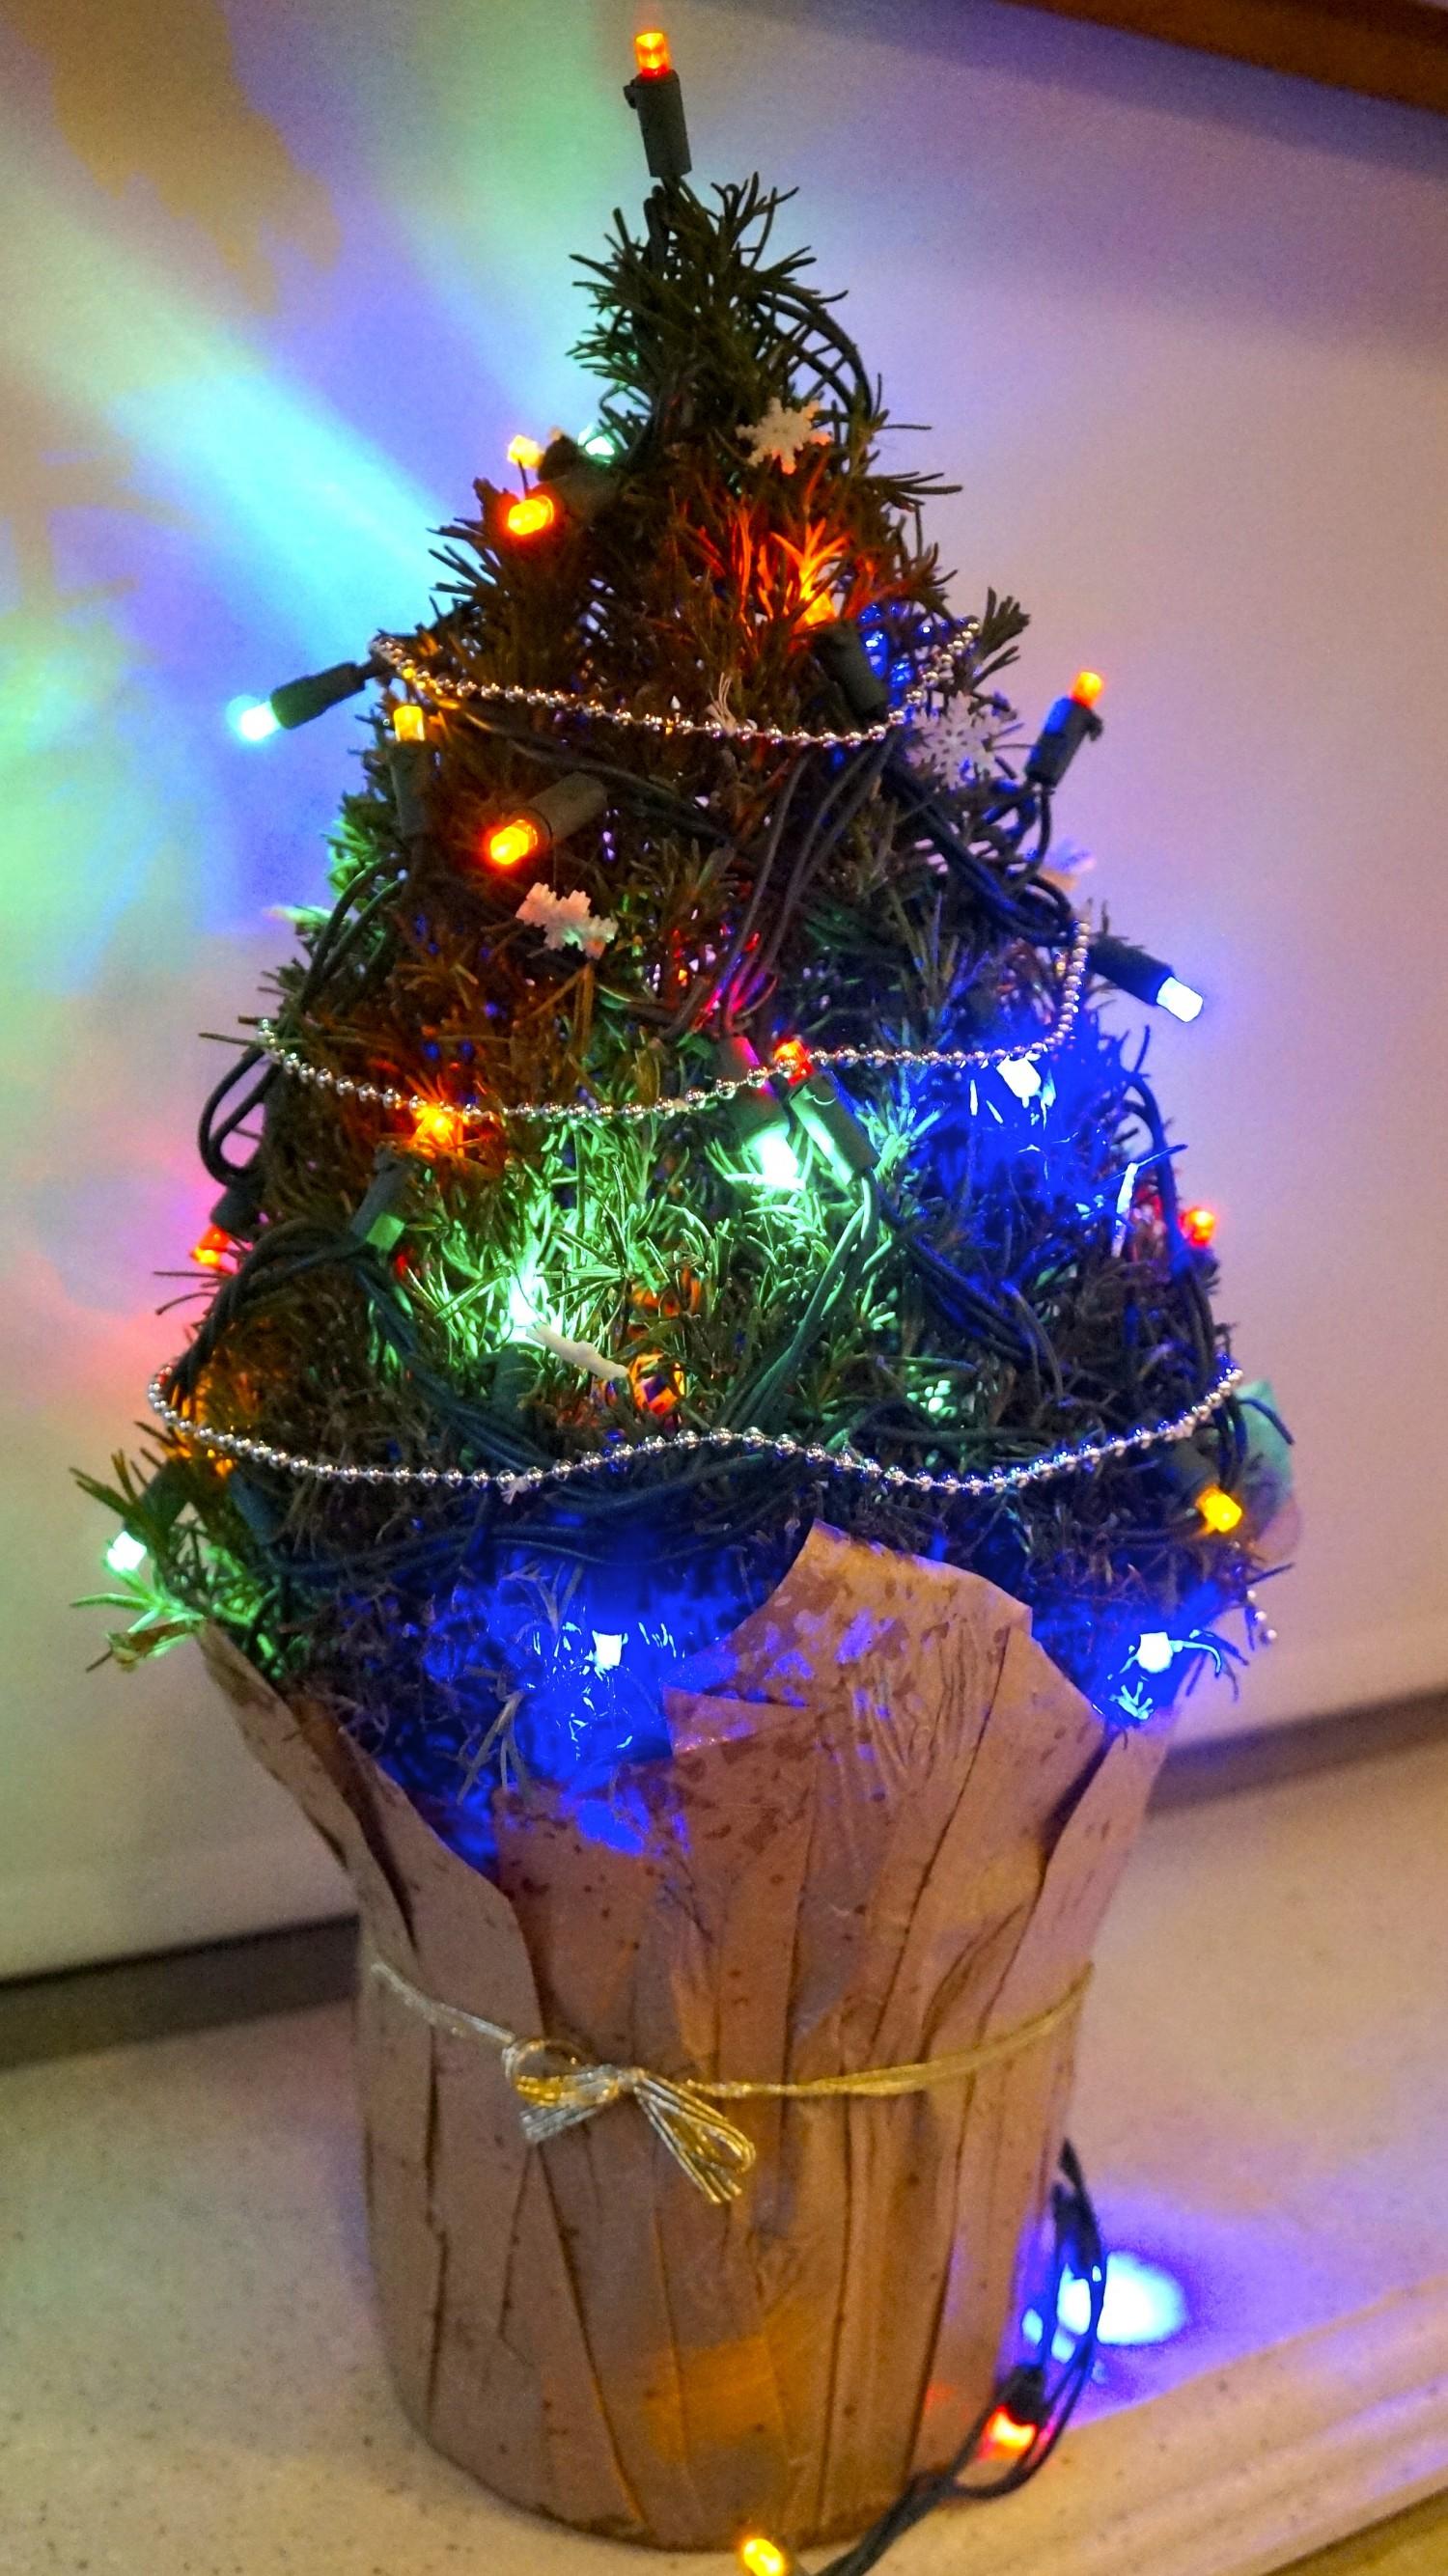 Rosemary Christmas Tree in the Motorhome